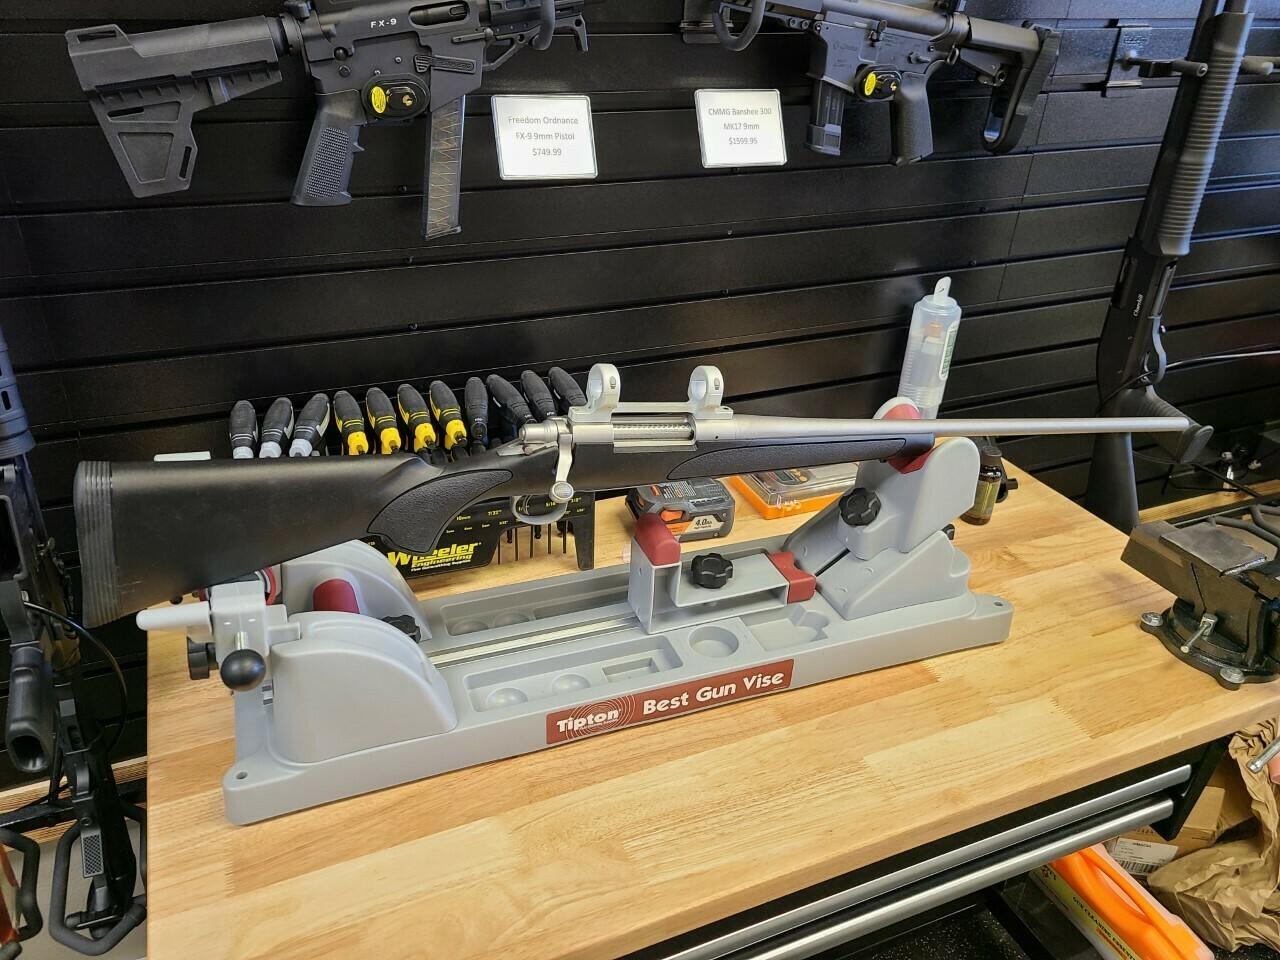 Remington 700 .300 Remington Ultra Mag